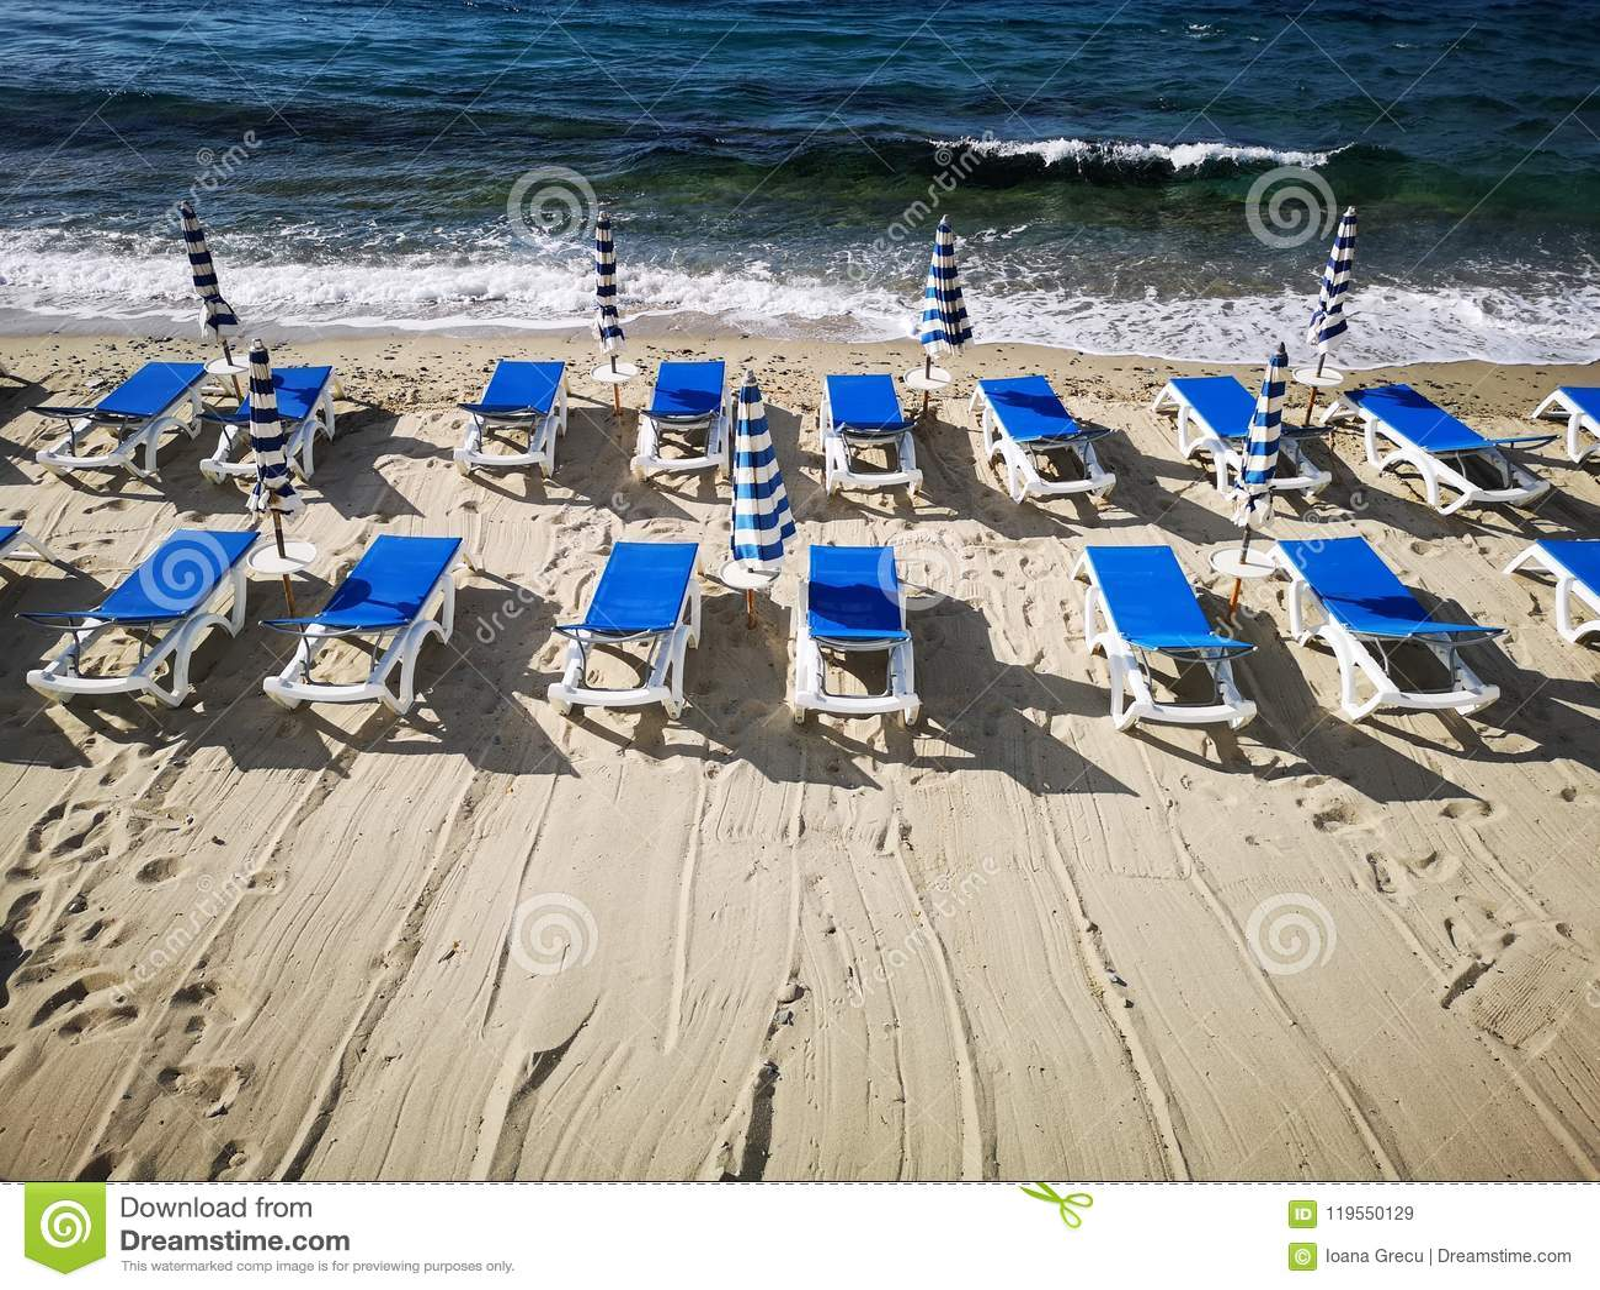 Beach lido ready for summer